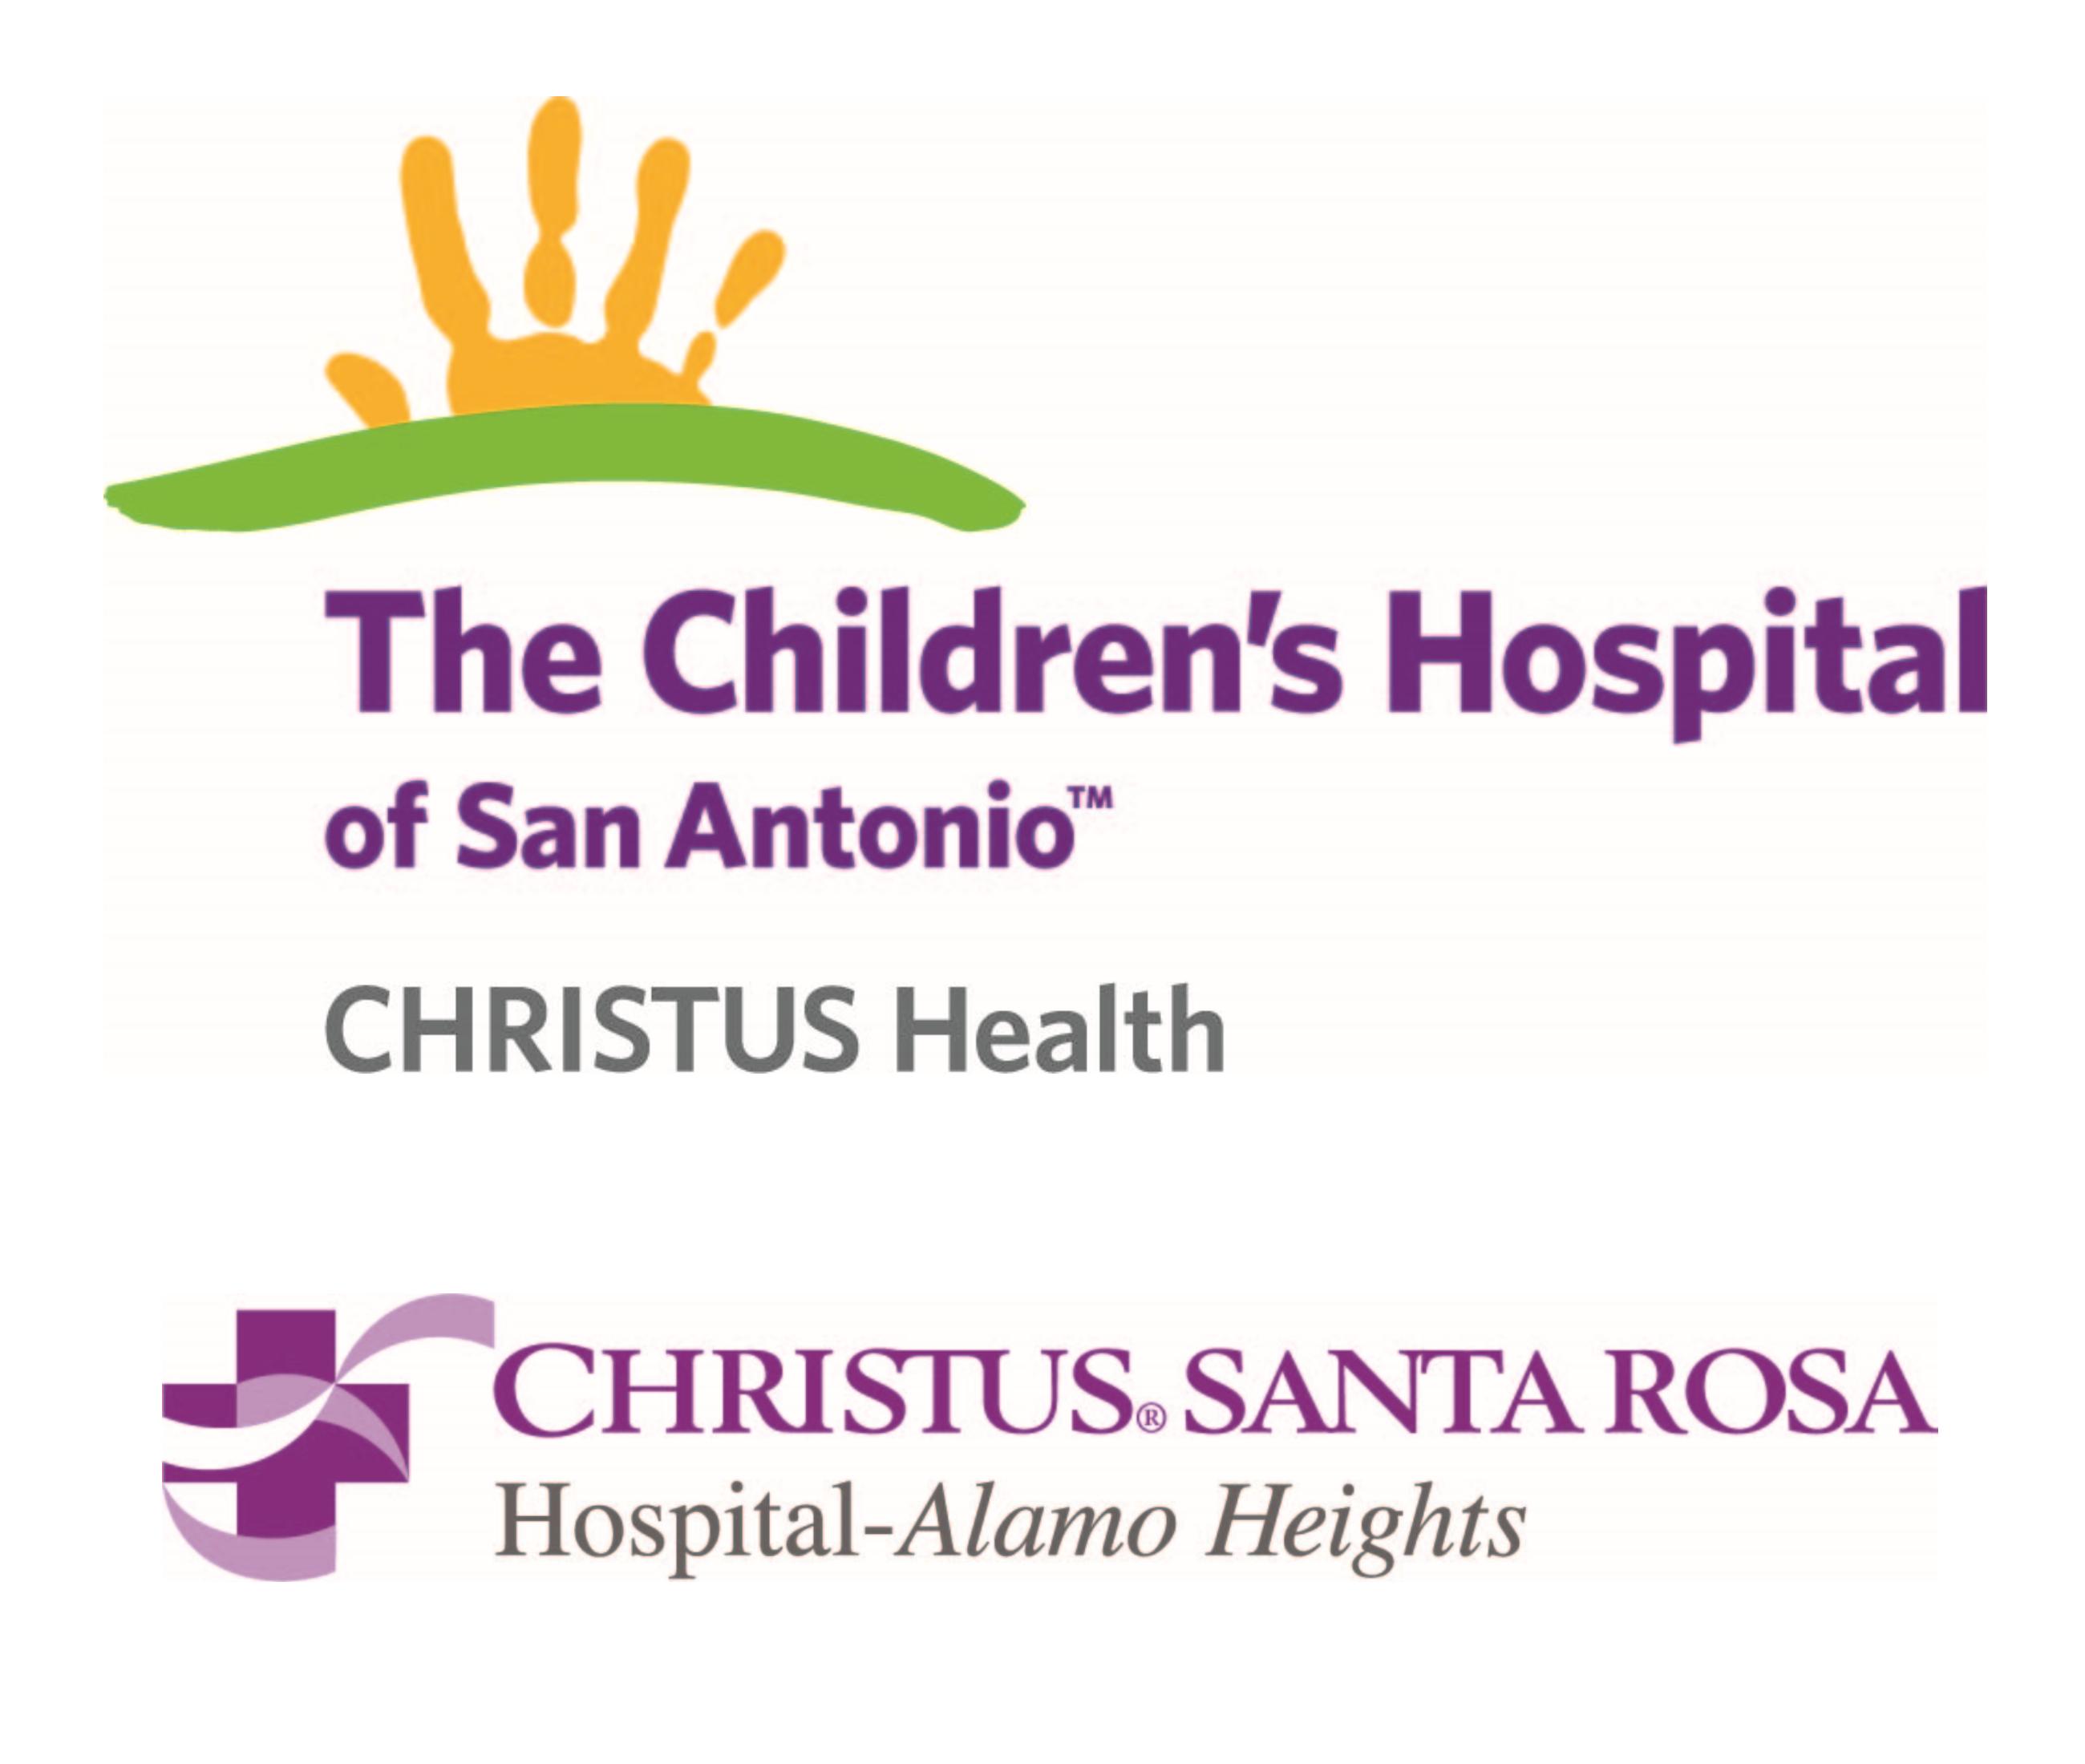 Christus Santa Rosa and Children's Hospital of San Antonio